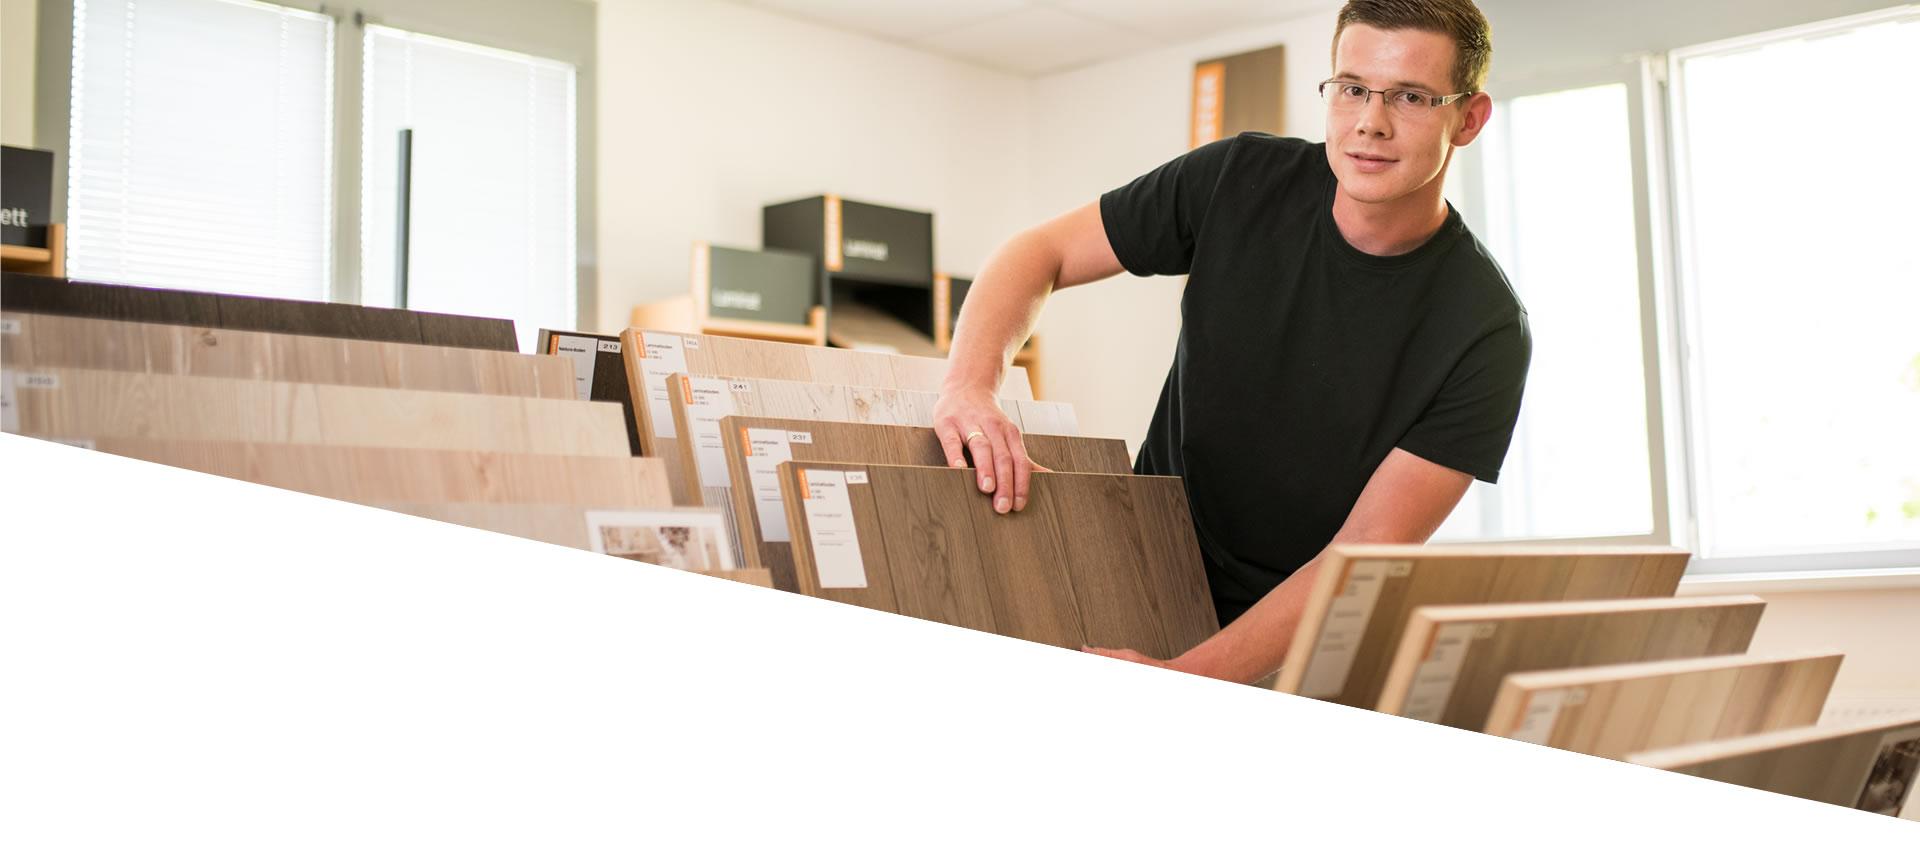 parkett reutlingen ihr parkett experte f r reutlingen bemb parkett parkett laminat vinyl in. Black Bedroom Furniture Sets. Home Design Ideas